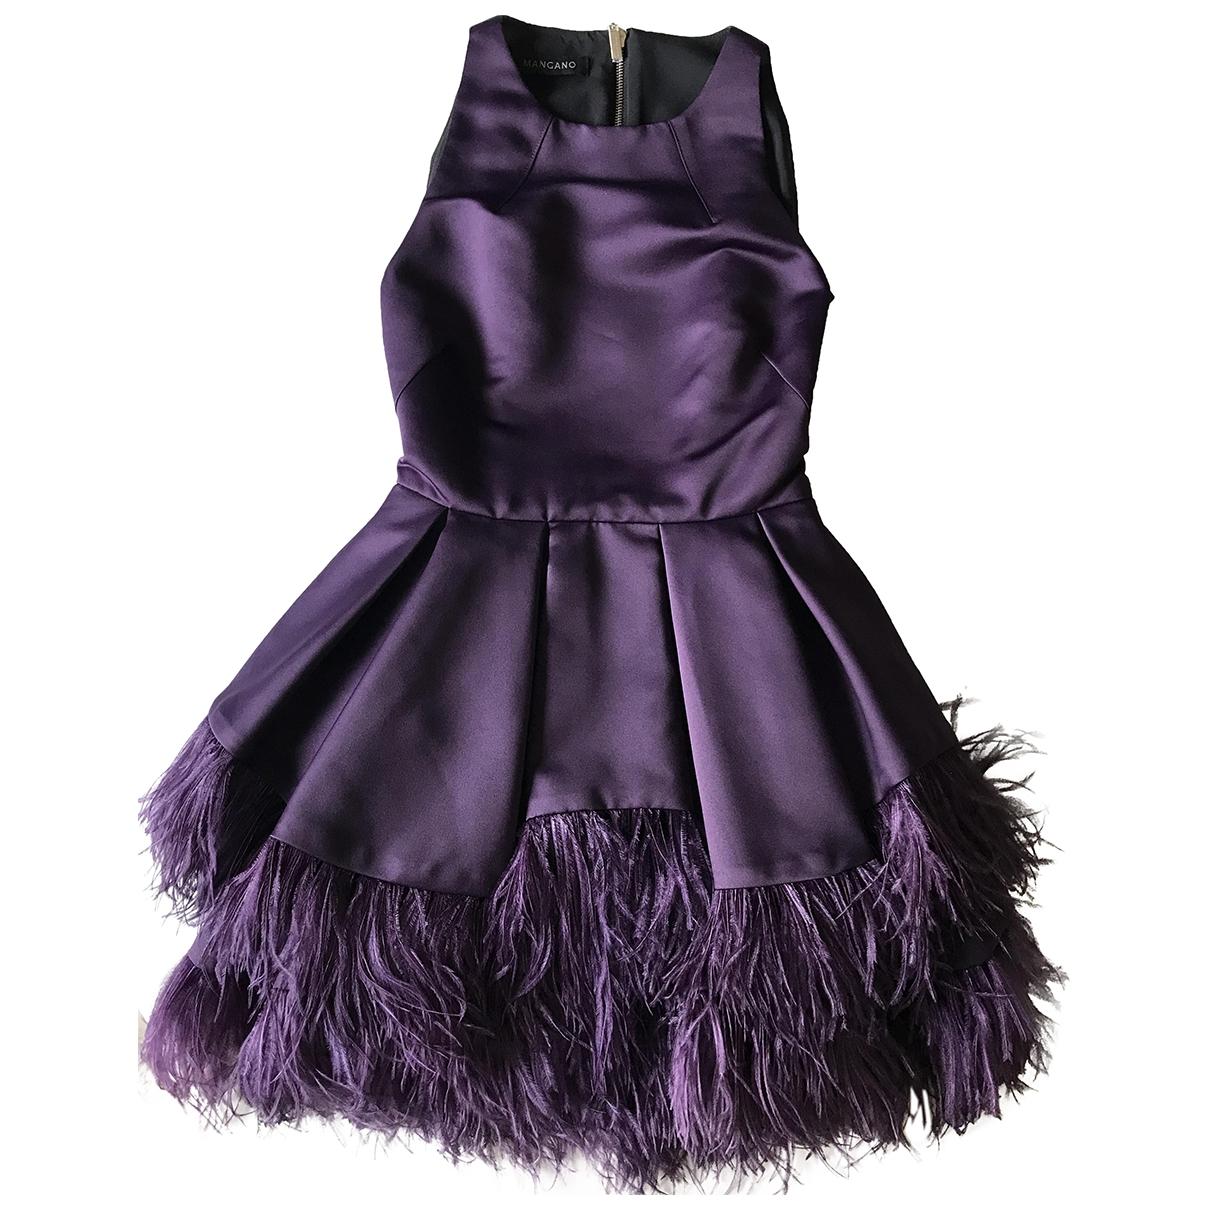 Mangano \N Kleid in  Lila Polyester